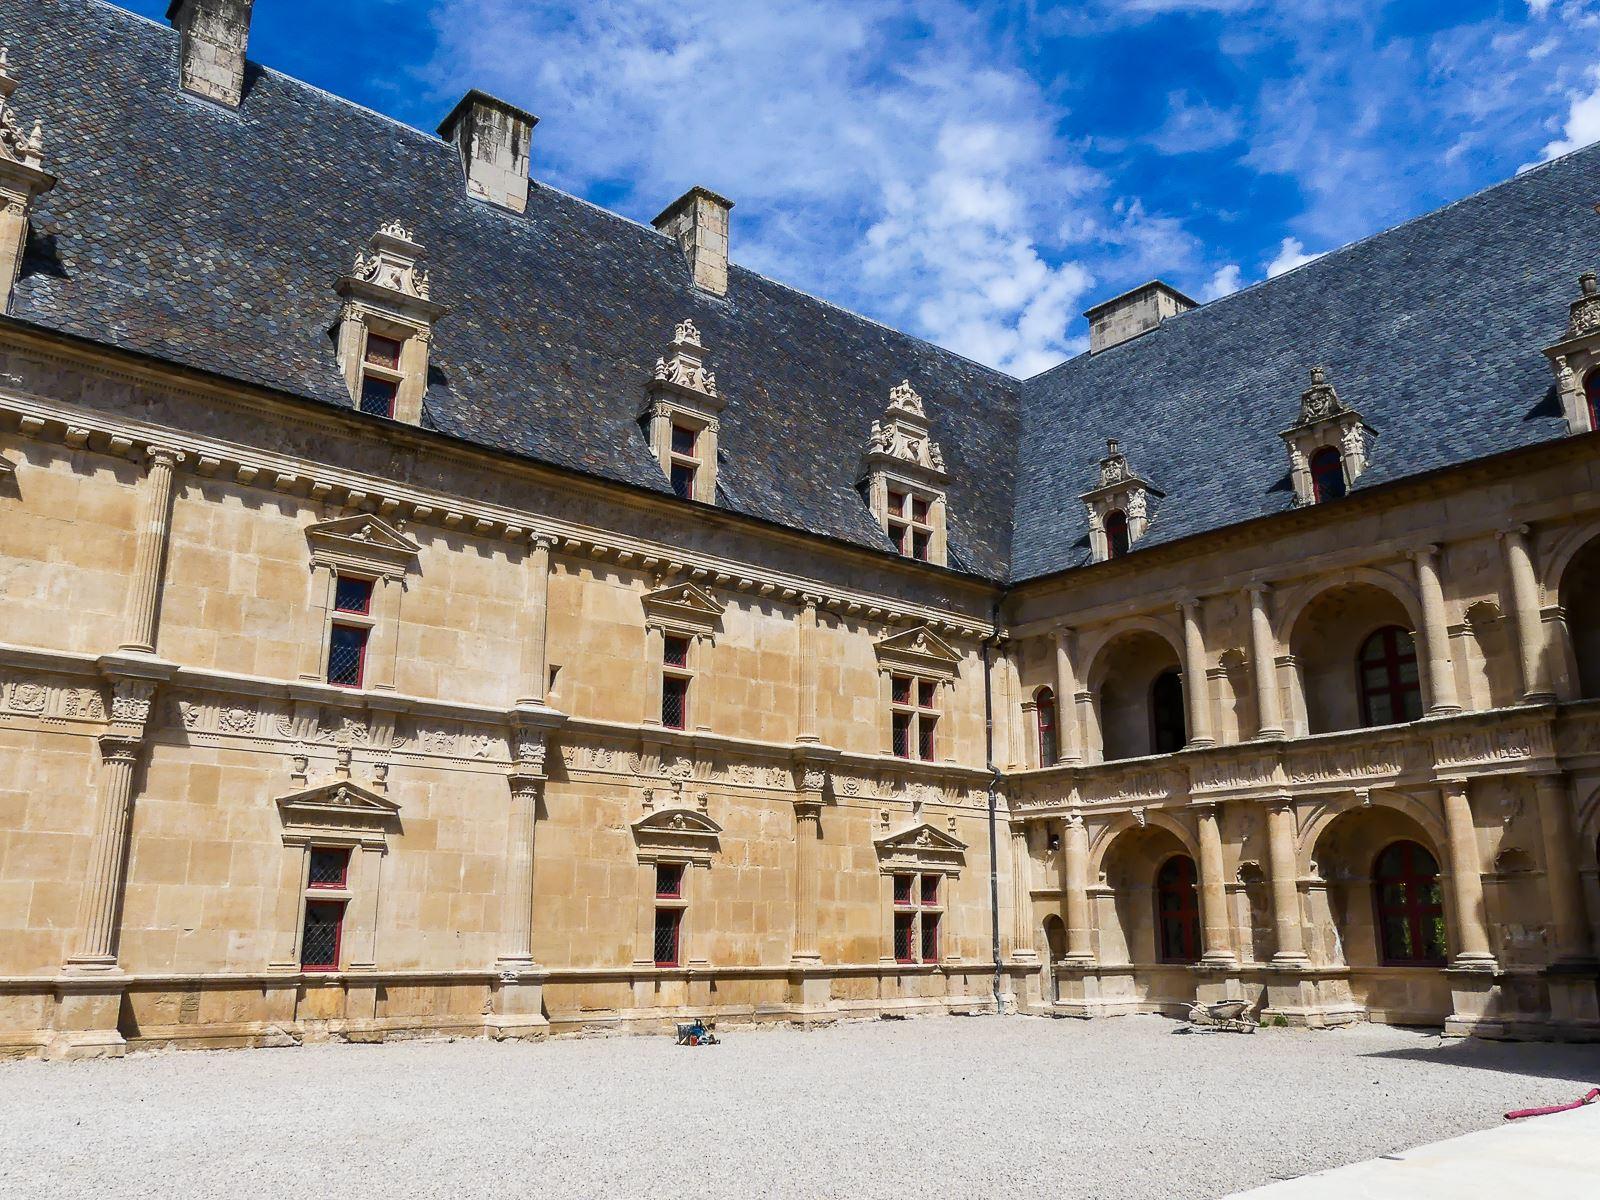 Château de Bournazel - Aveyron